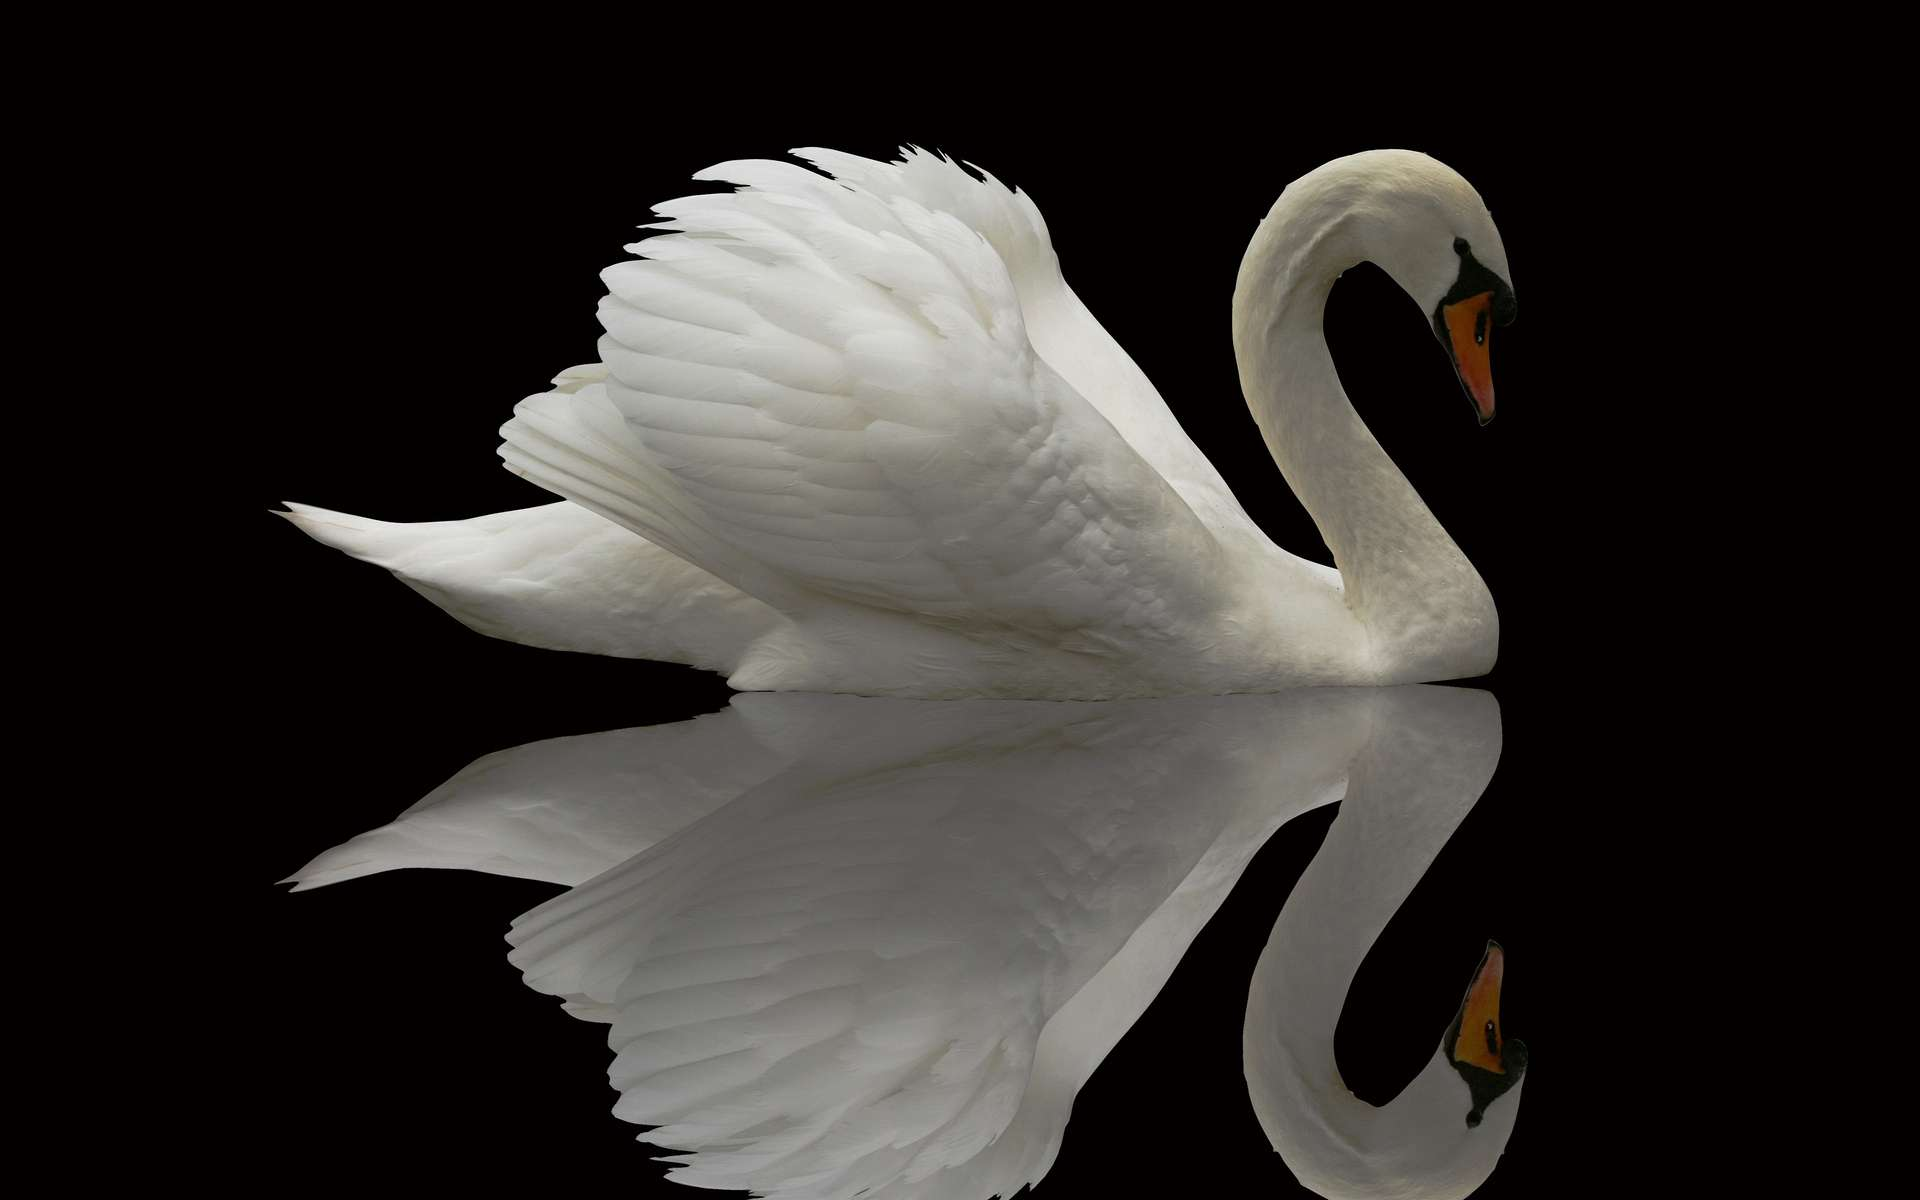 Swan Wallpapers 1920x1200